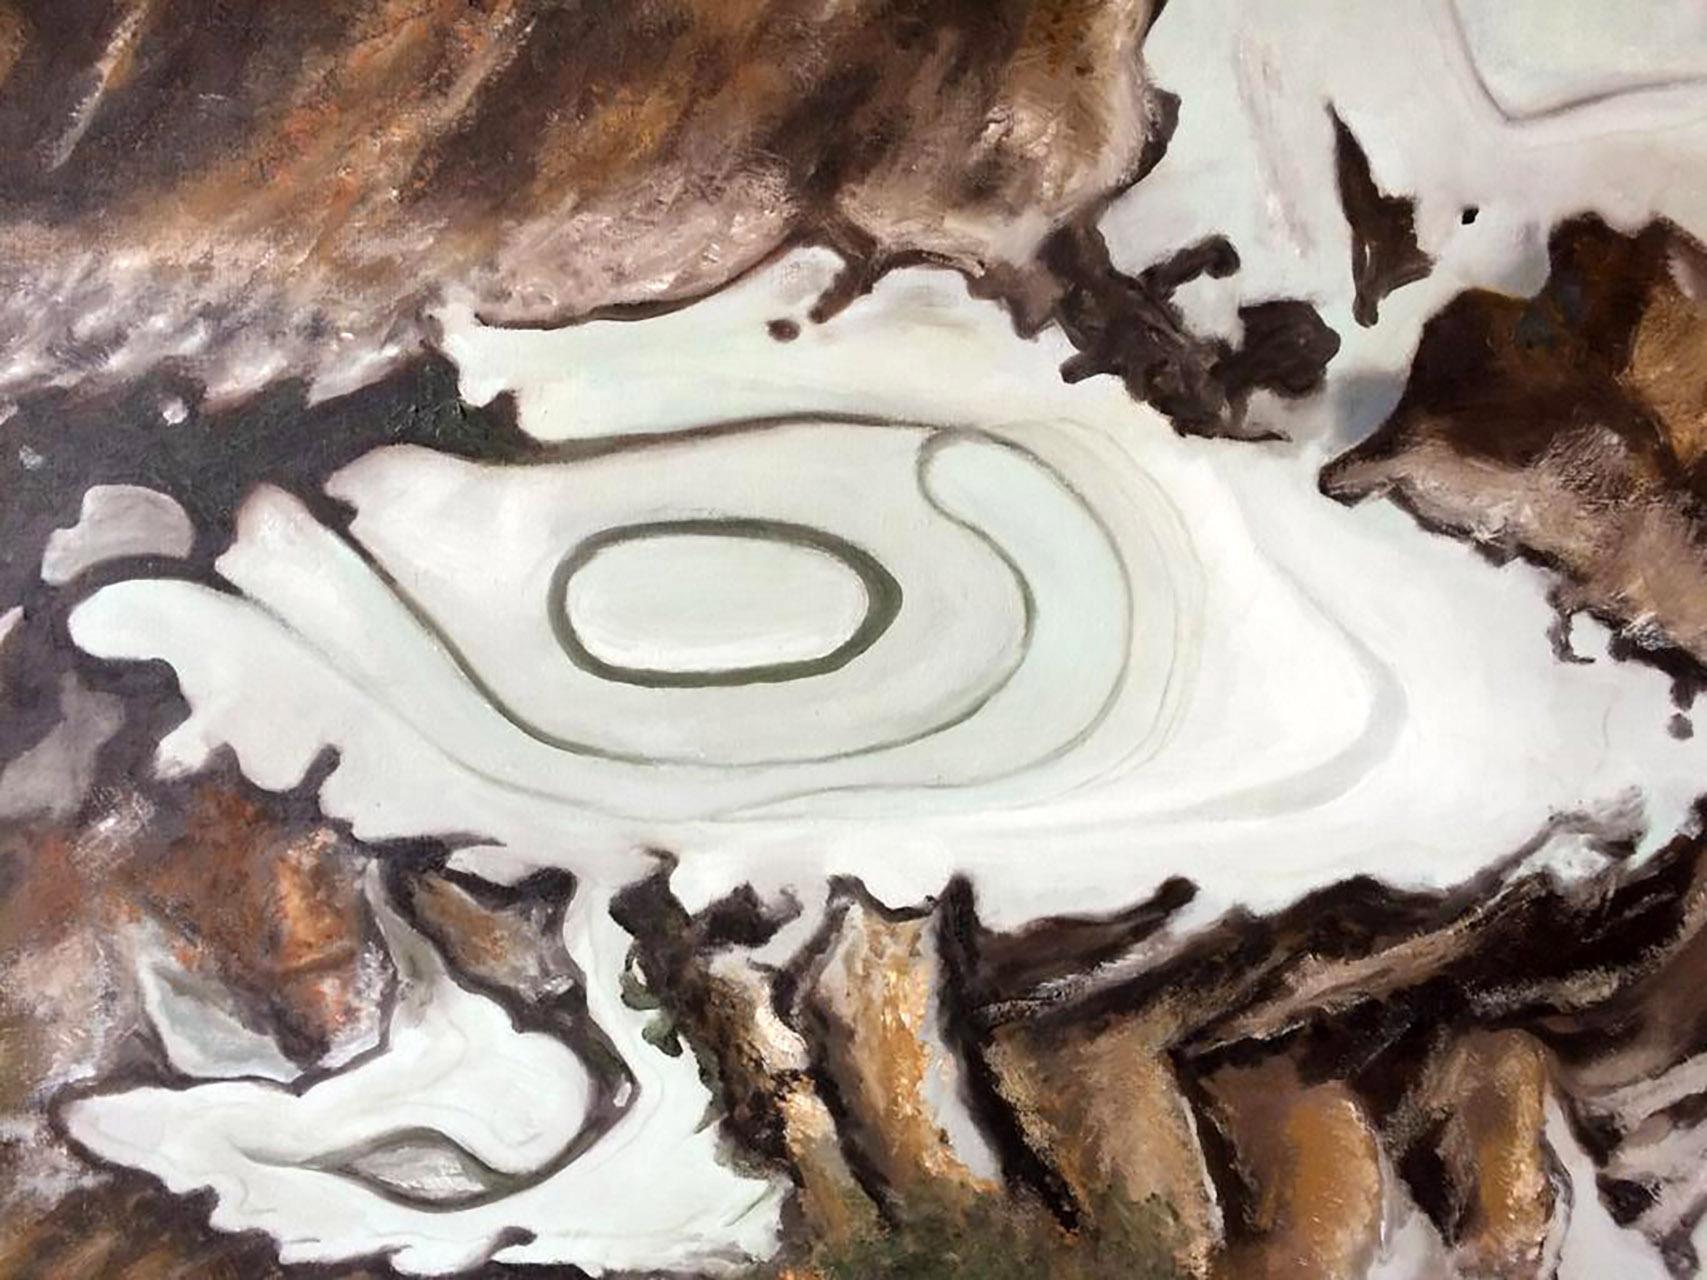 Tiny Dijstelbloem_Modder en ijs_olie op canvas_60x70